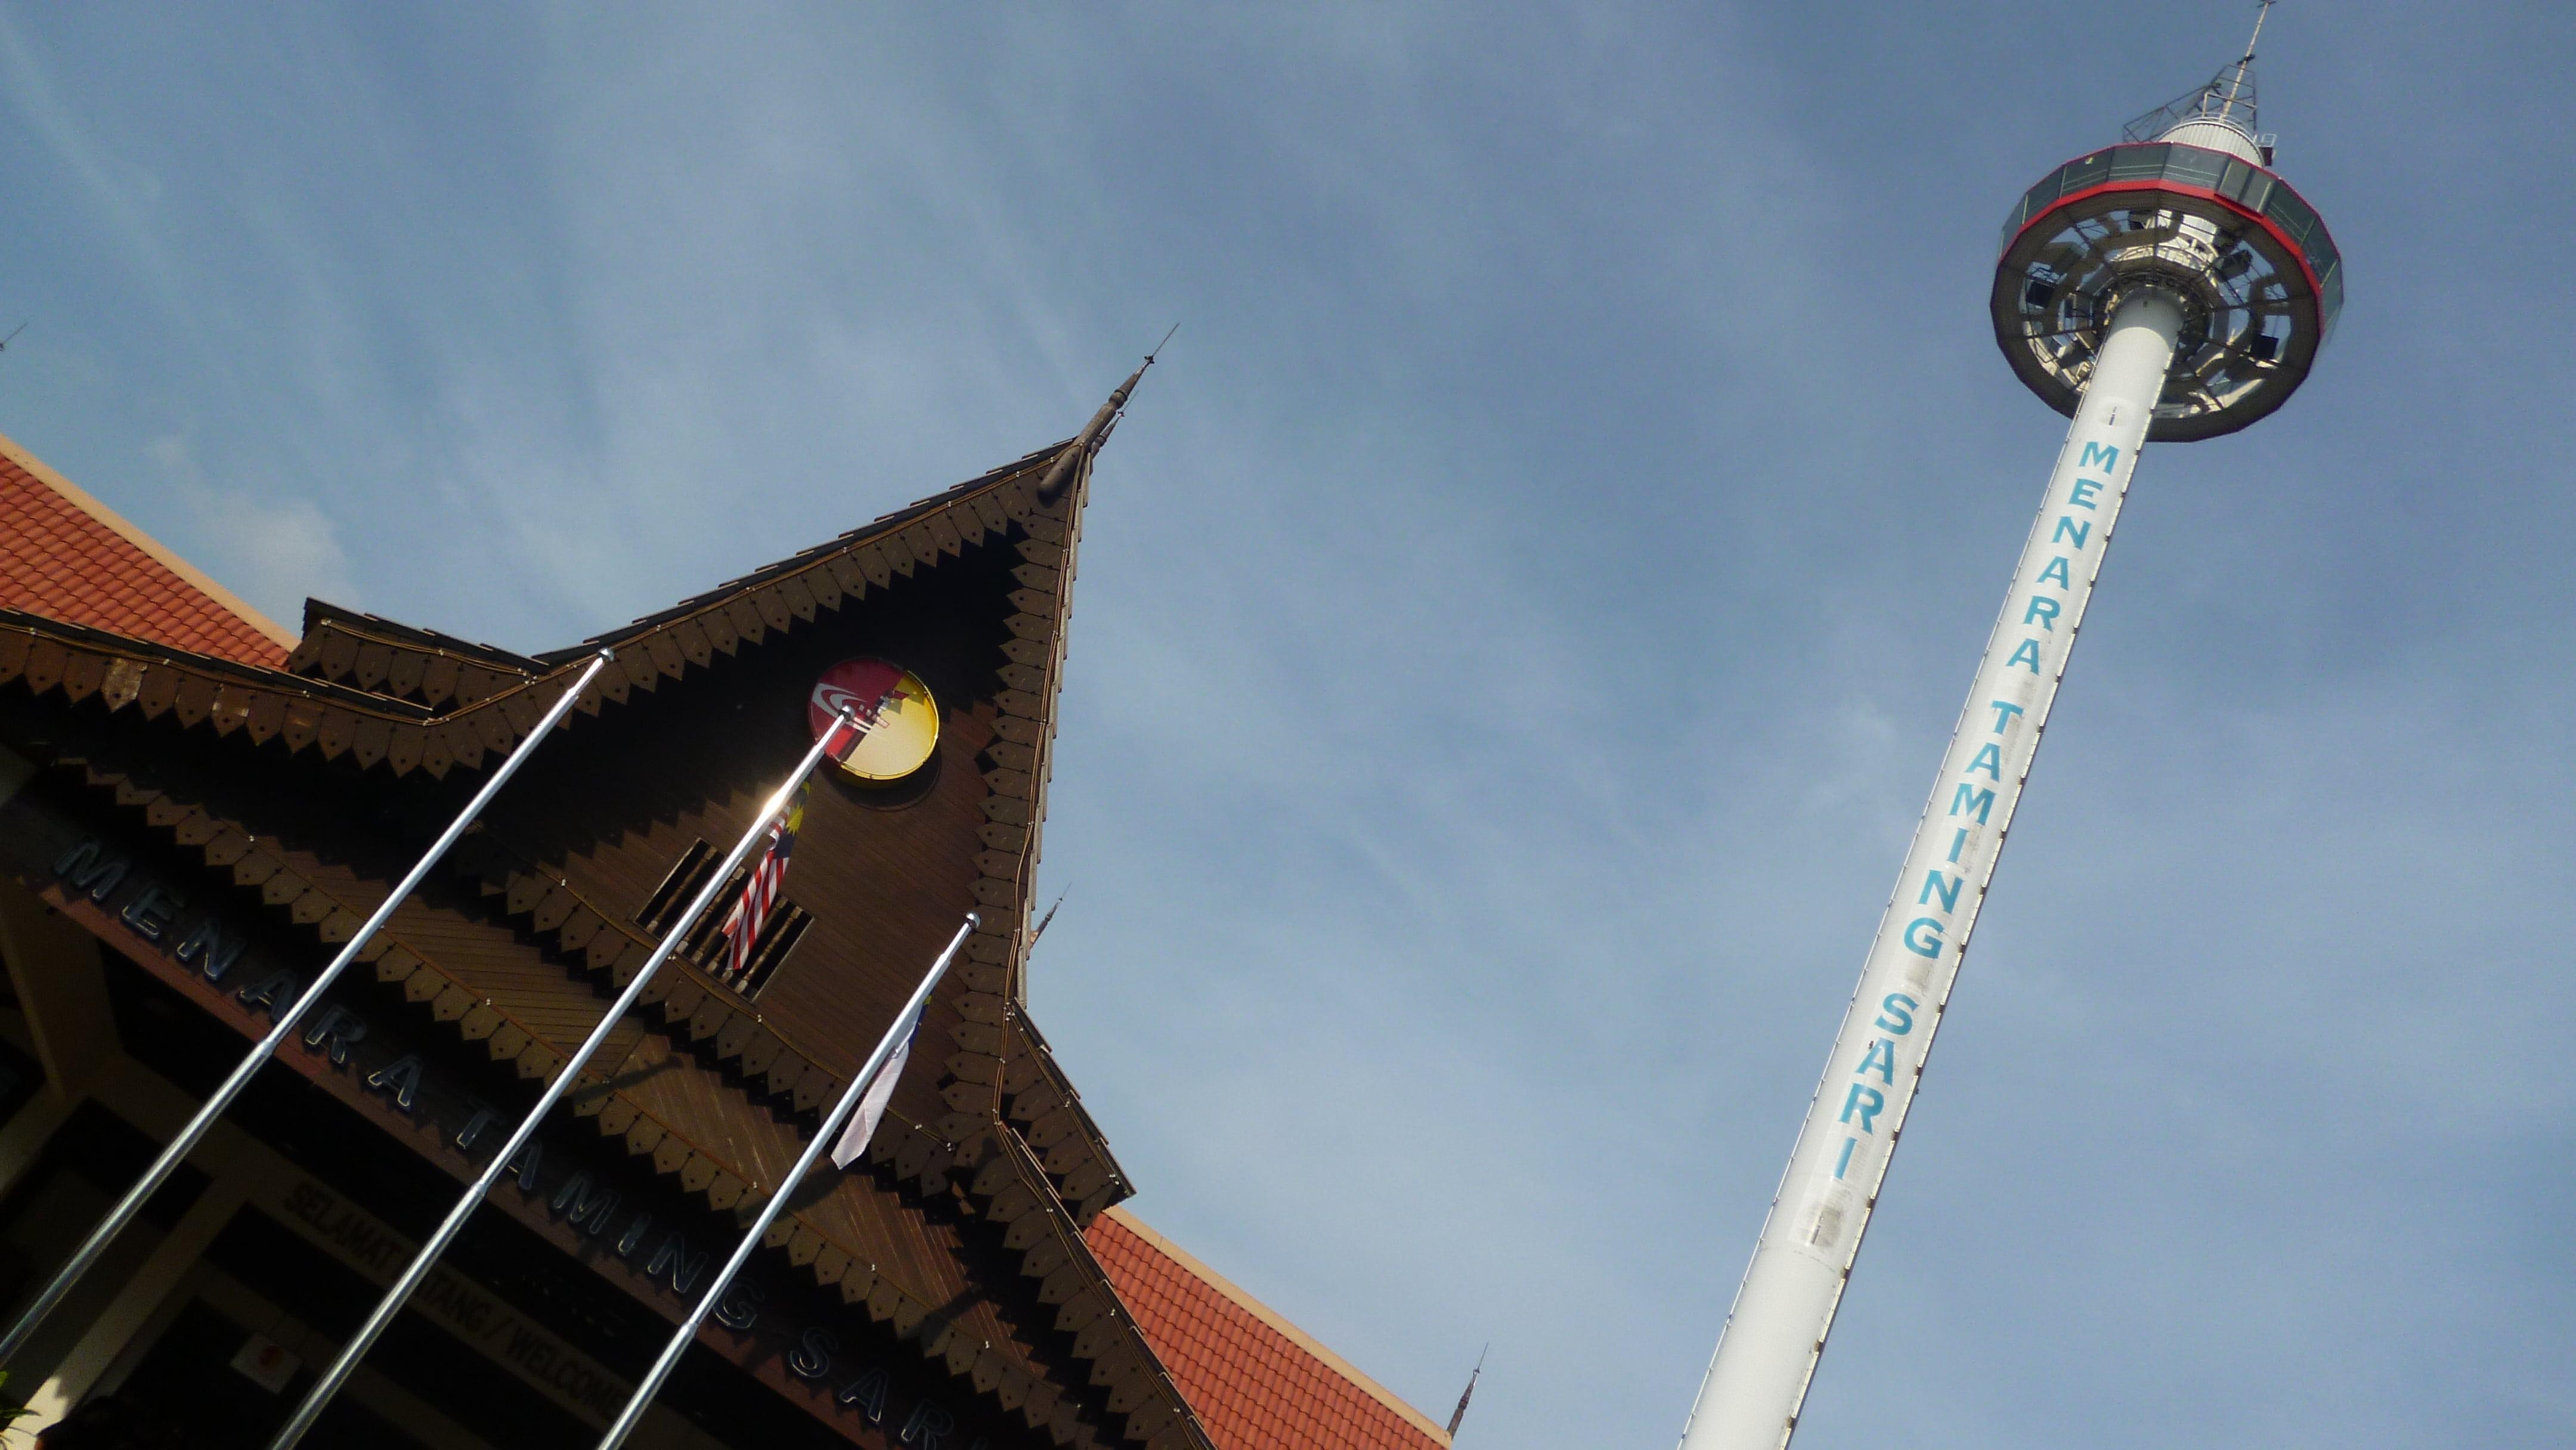 Malacca Malezya'daki Tamang Sari Deniz Feneri